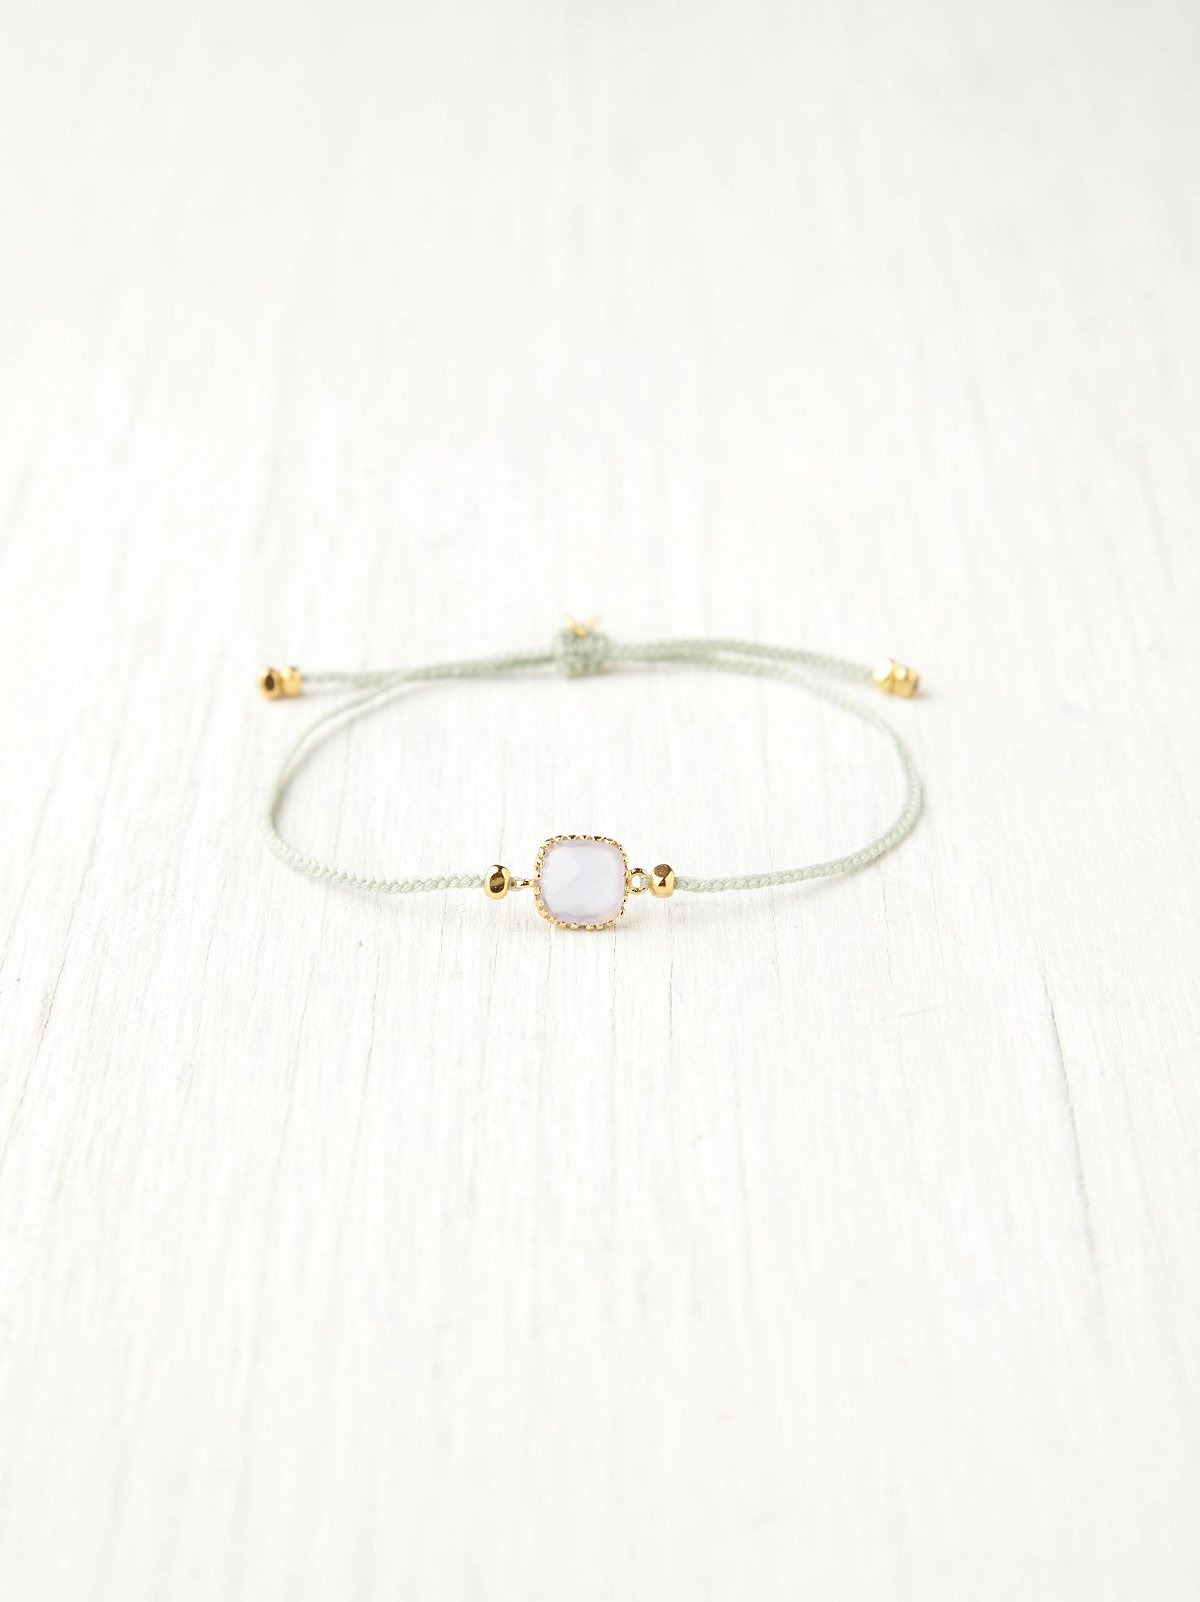 Gem Stone Tai Bracelet